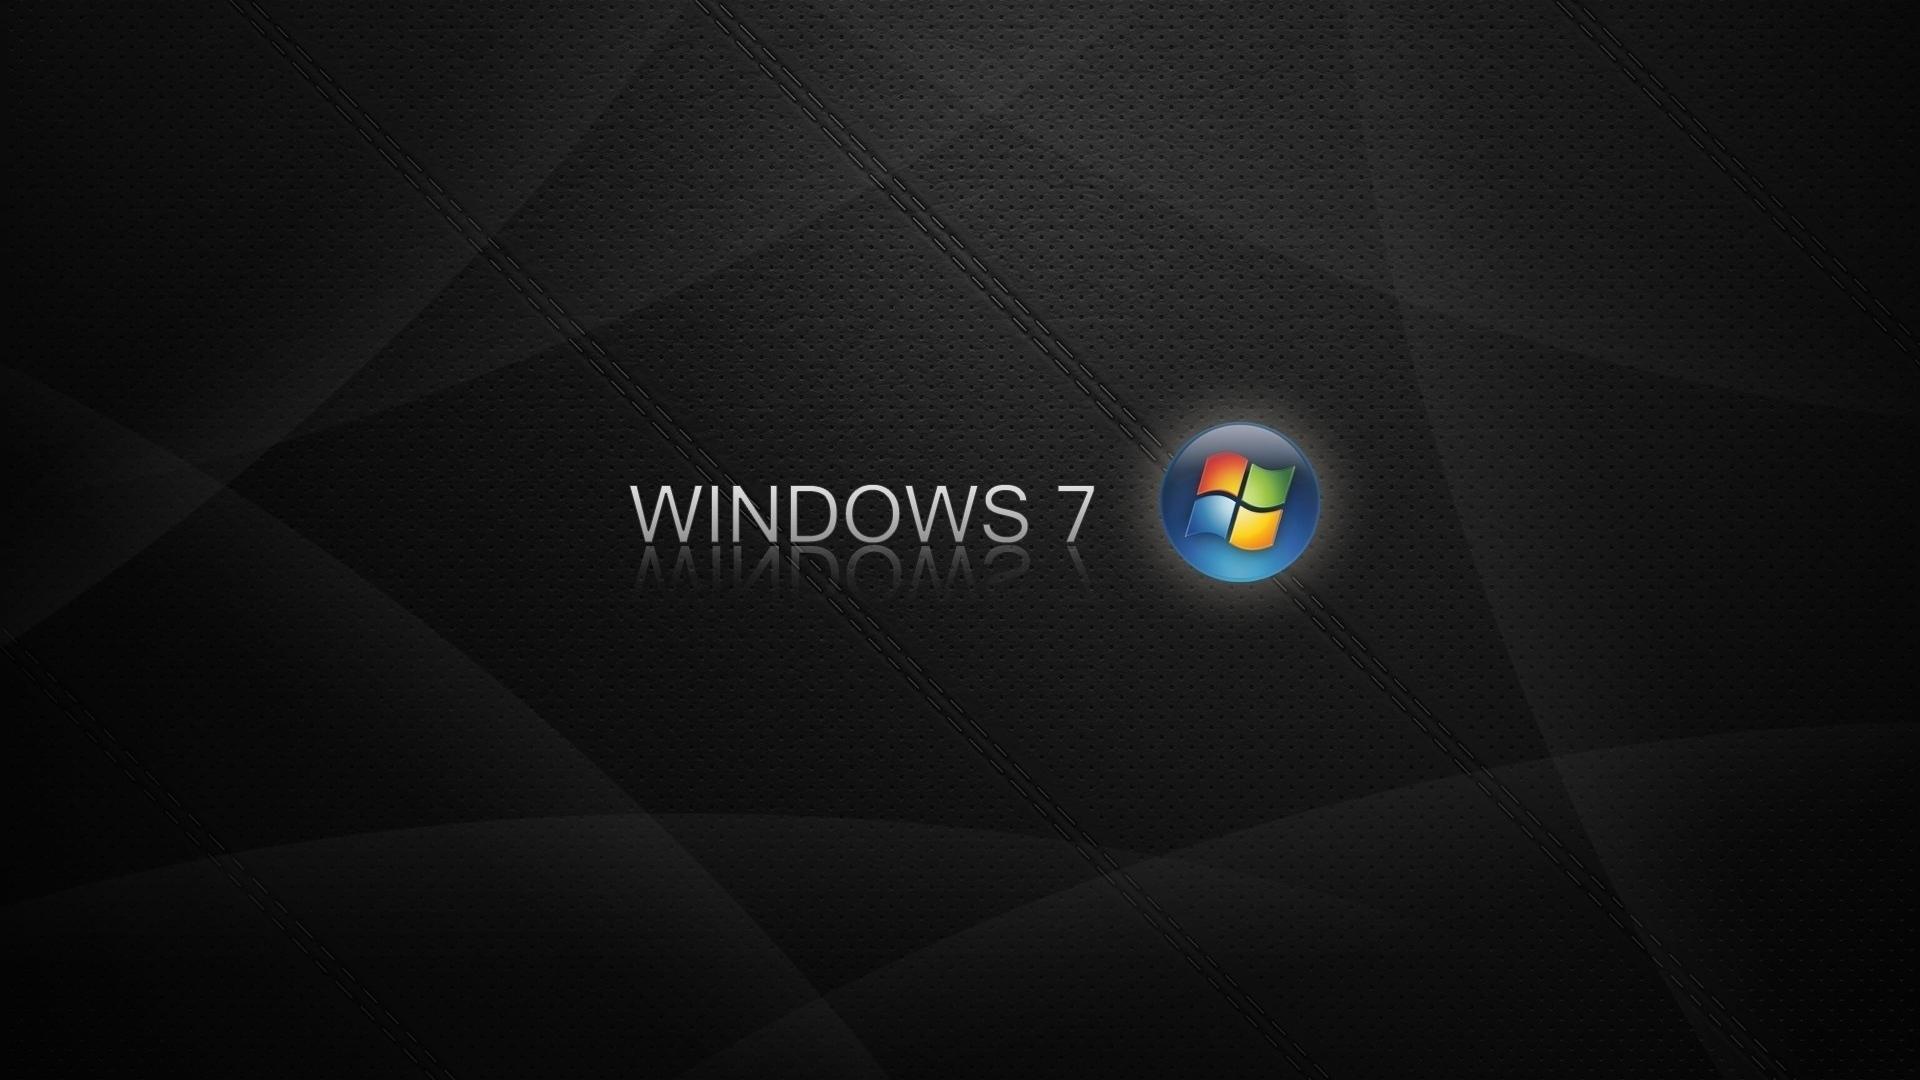 Download Wallpaper 1920x1080 Windows 7, Logo, Blue, Orange, Black